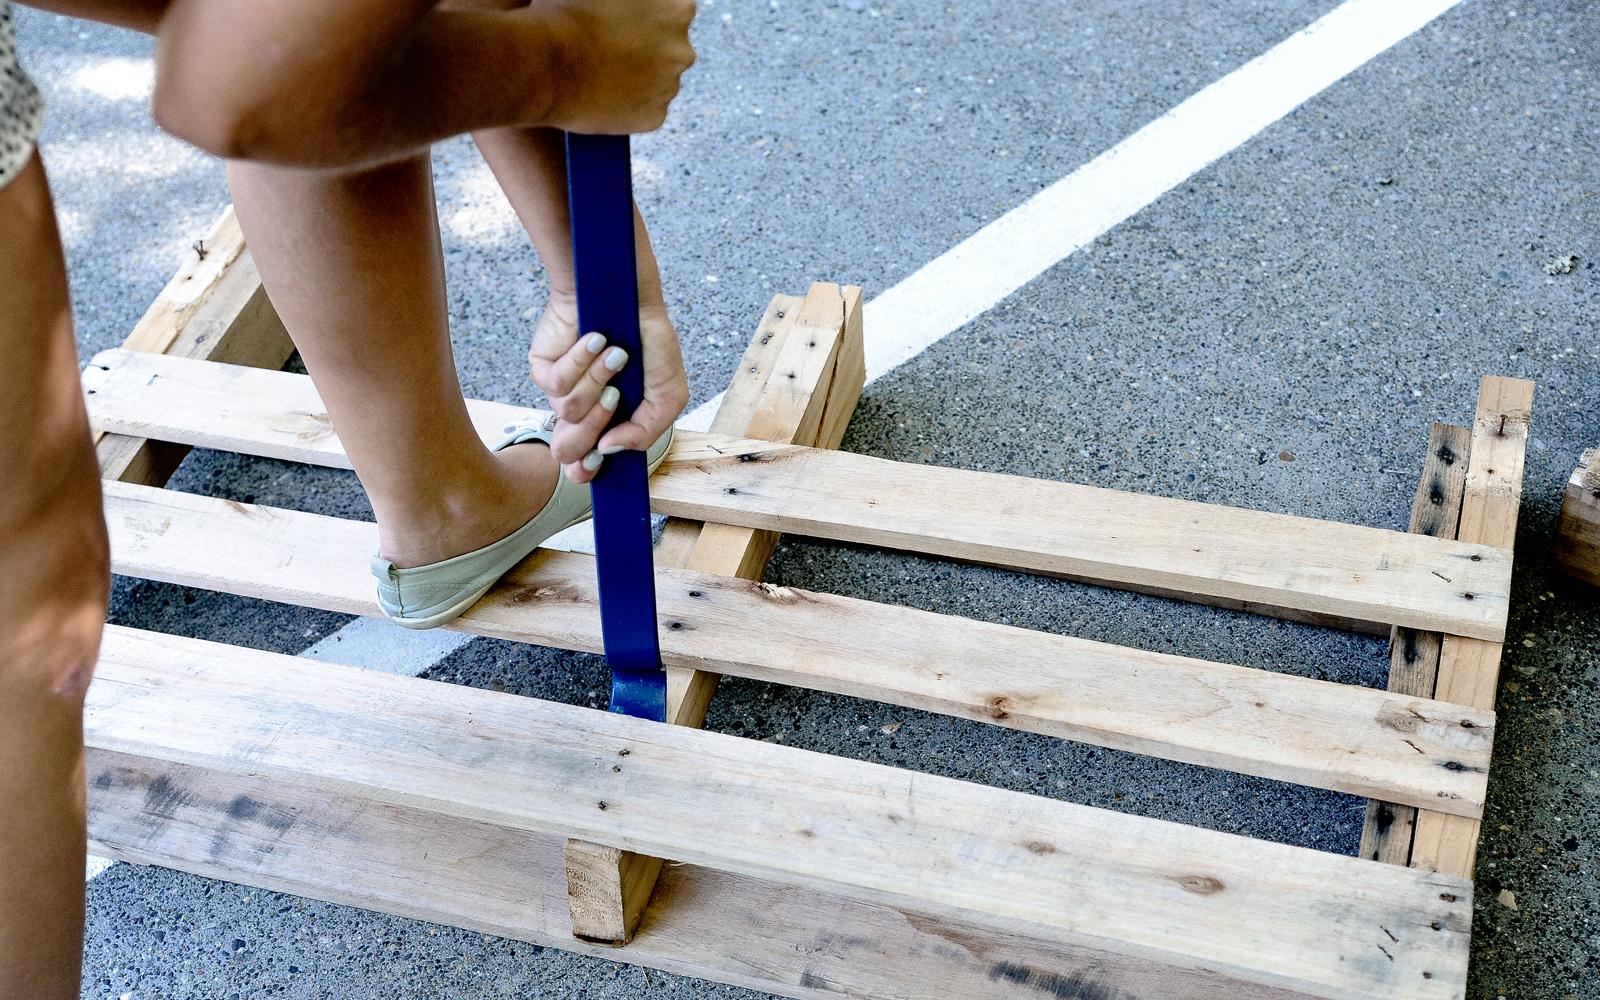 wood pallet for coat hanger